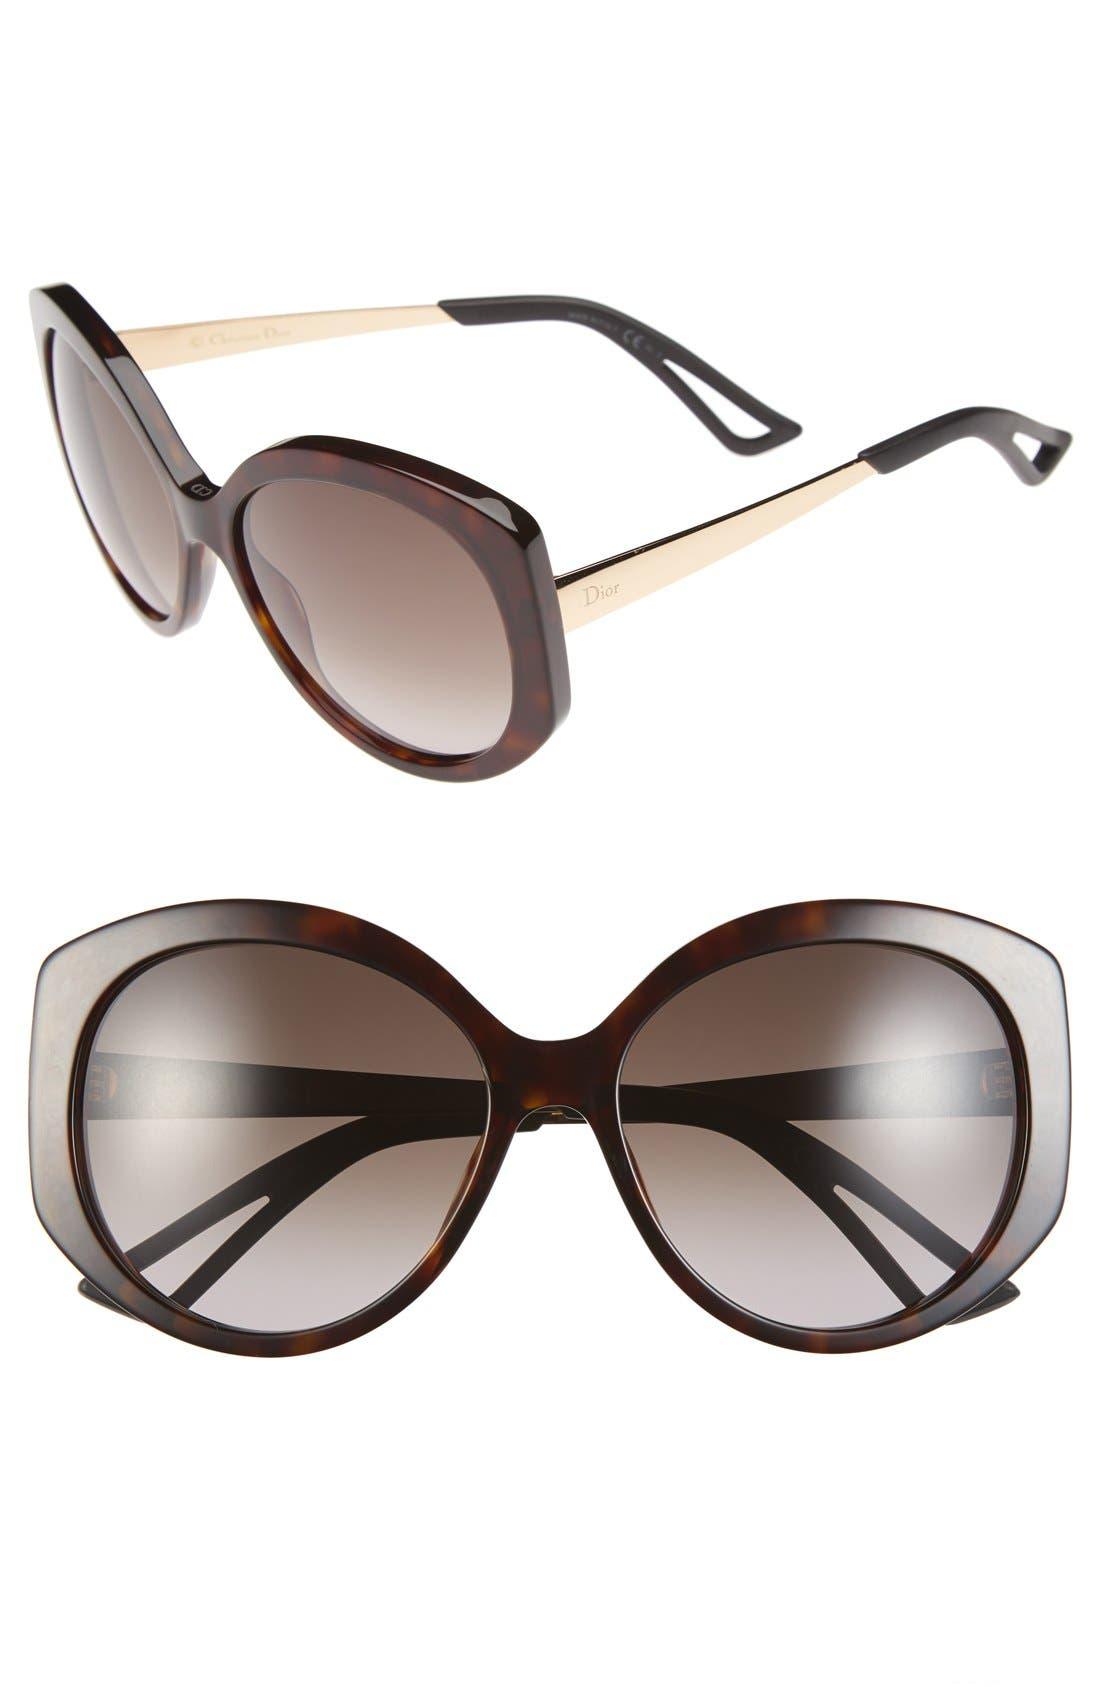 Main Image - Dior Extase 1 58mm Sunglasses